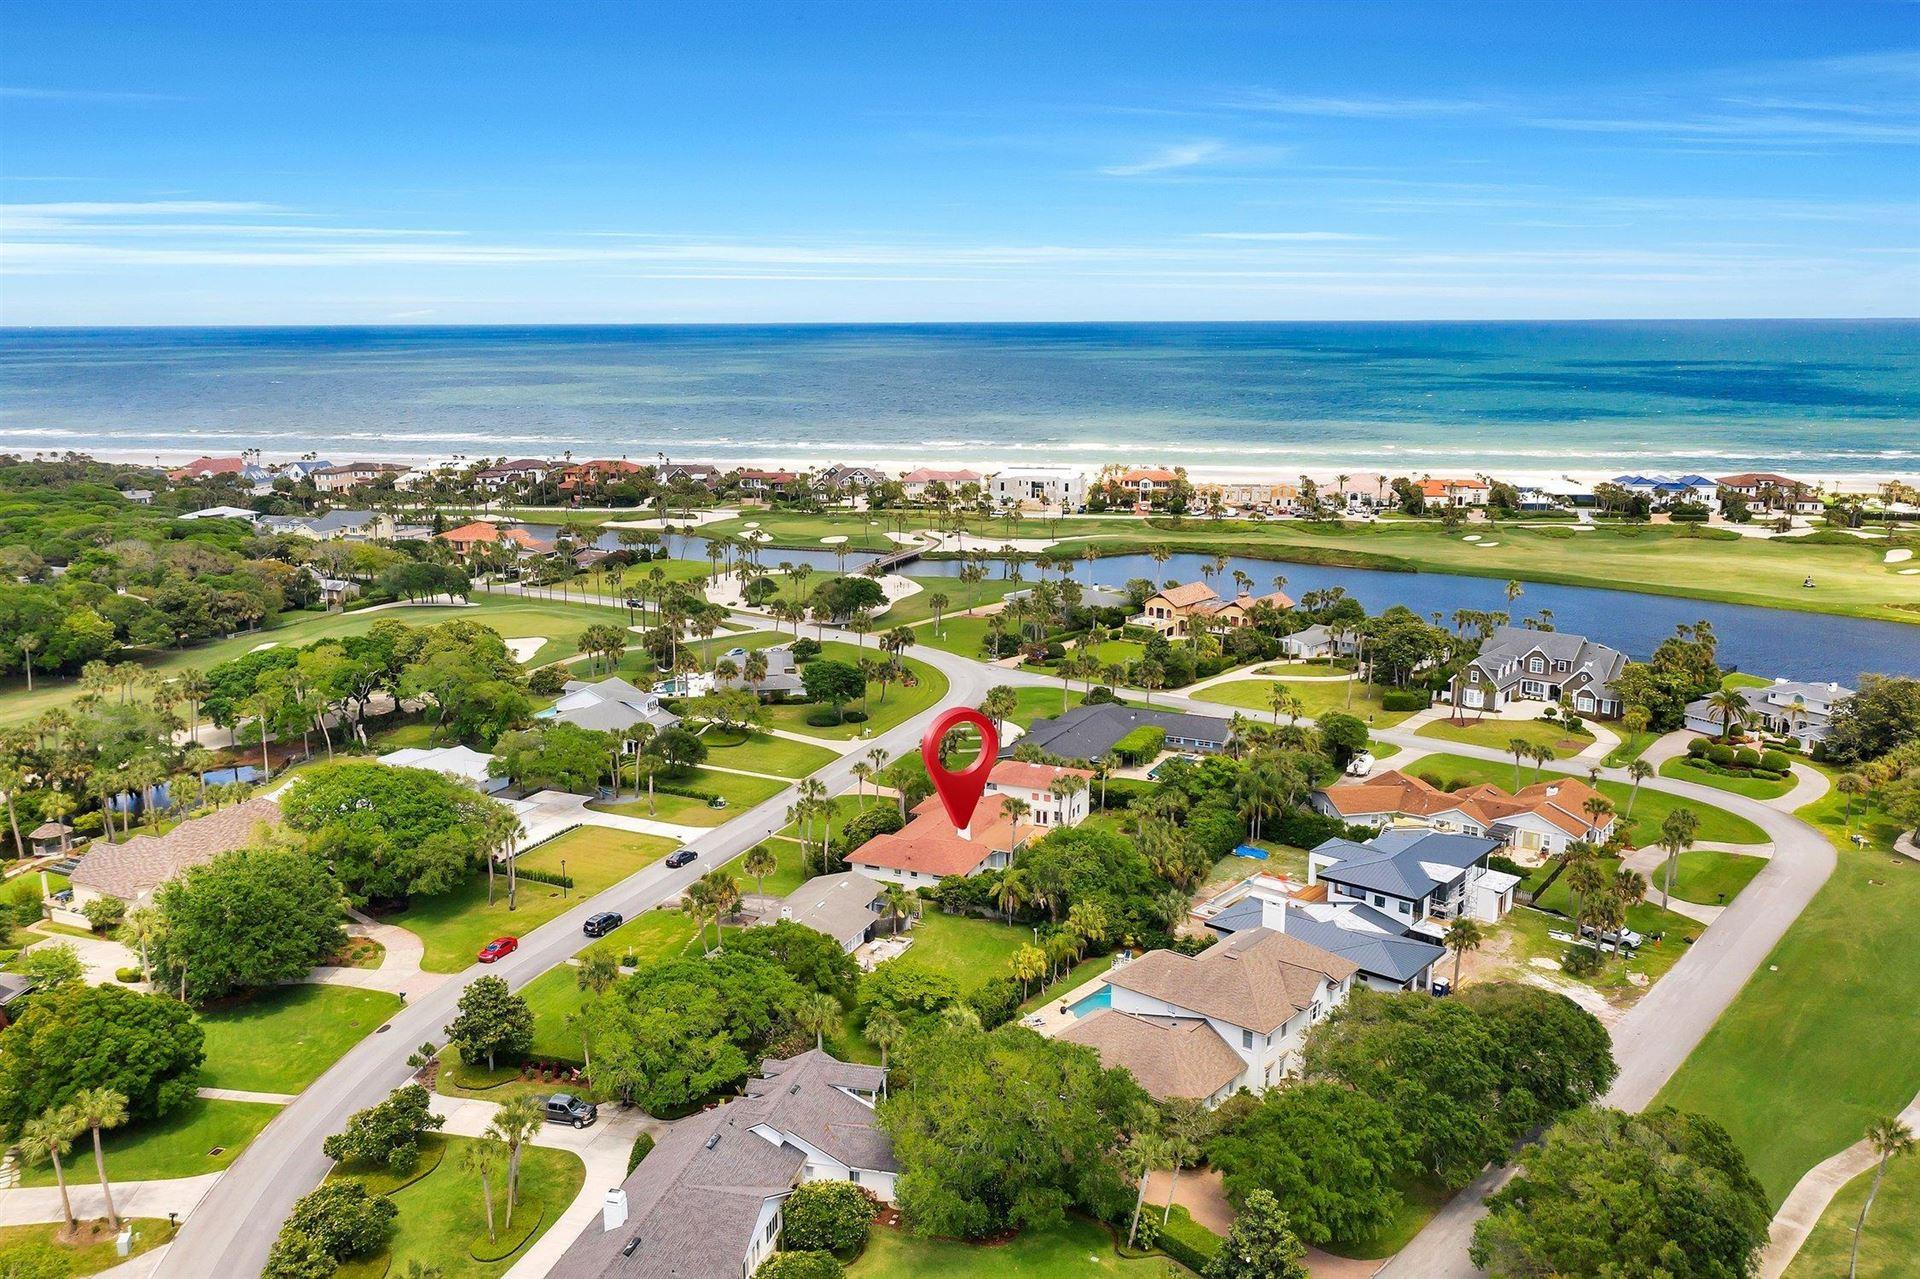 75 SAN JUAN DR, Ponte Vedra Beach, FL 32082 - MLS#: 1106529